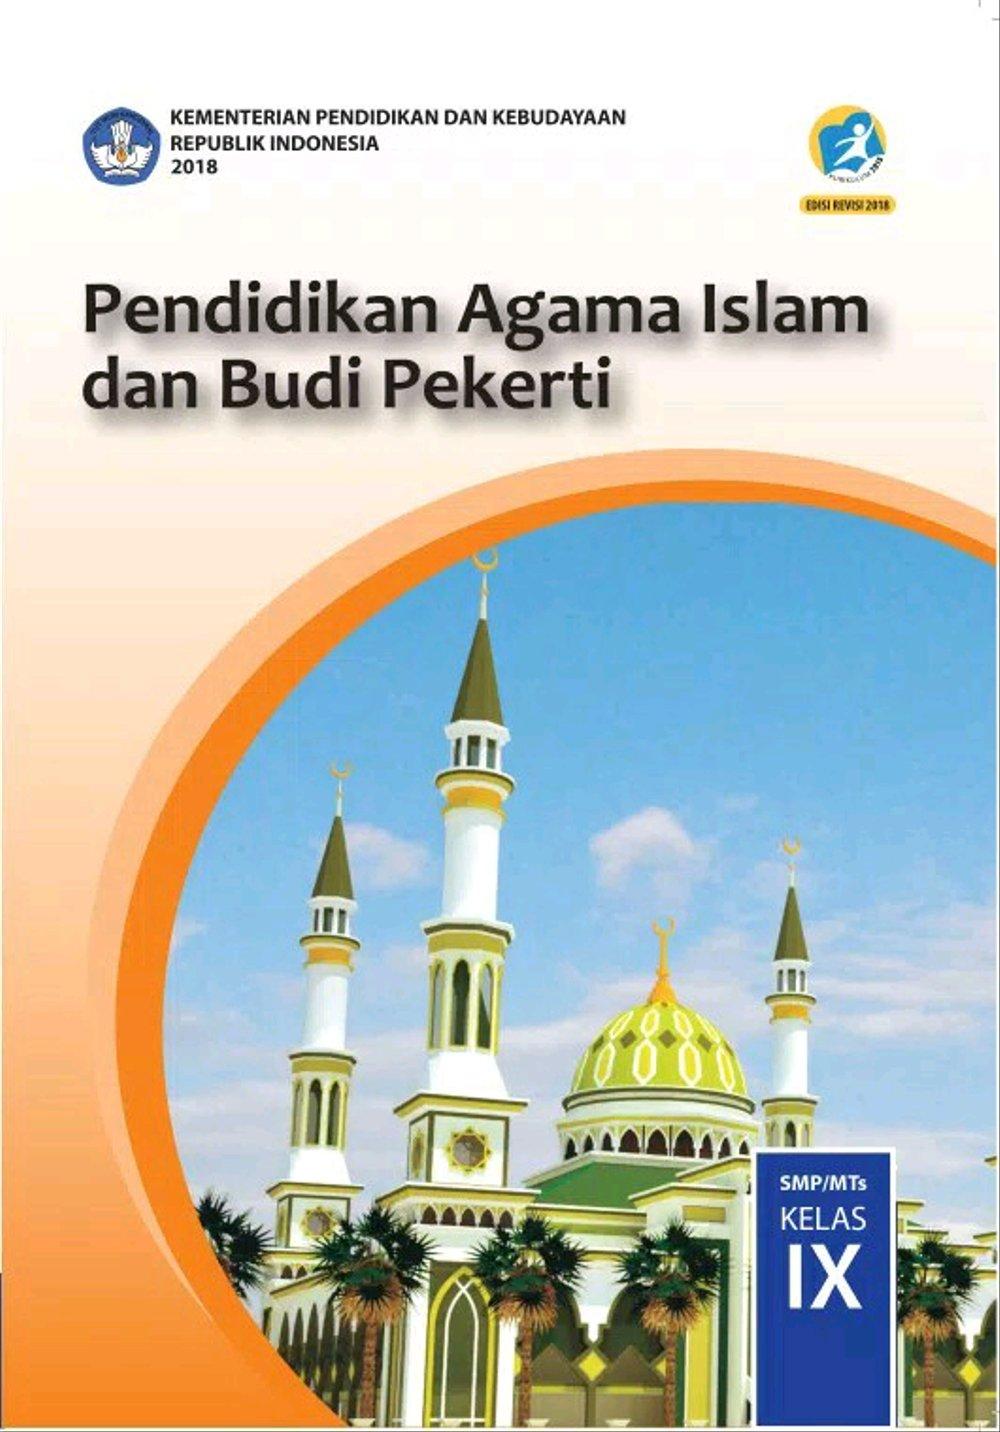 Soal Dan Jawaban Pilihan Ganda Pendidikan Agama Islam Smp Kelas 9 Halaman 102 S D 104